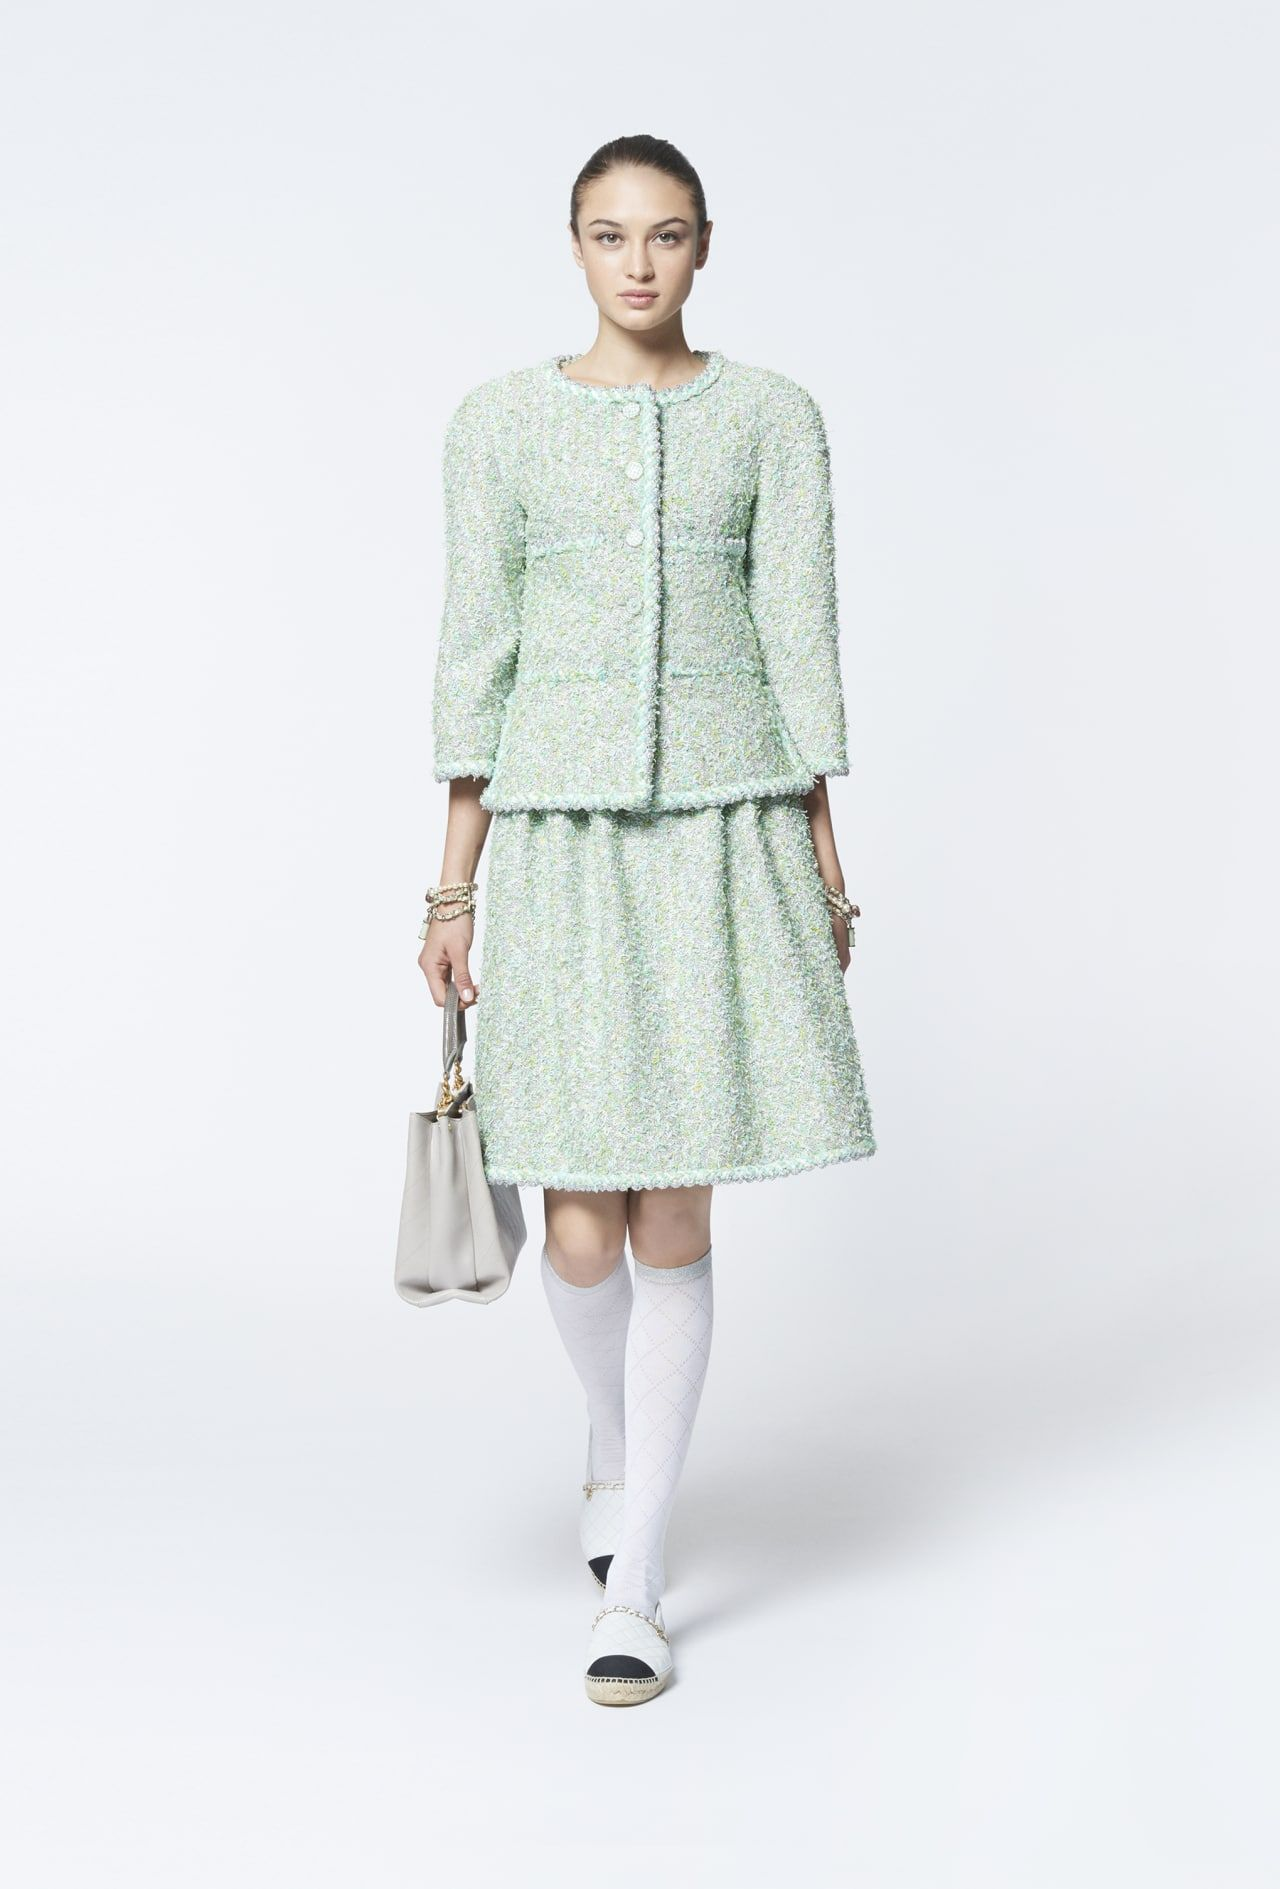 6e84e6d1c0 Look 23 - Spring-Summer 2018 Pre-Collection - Ready-to-wear - CHANEL ...